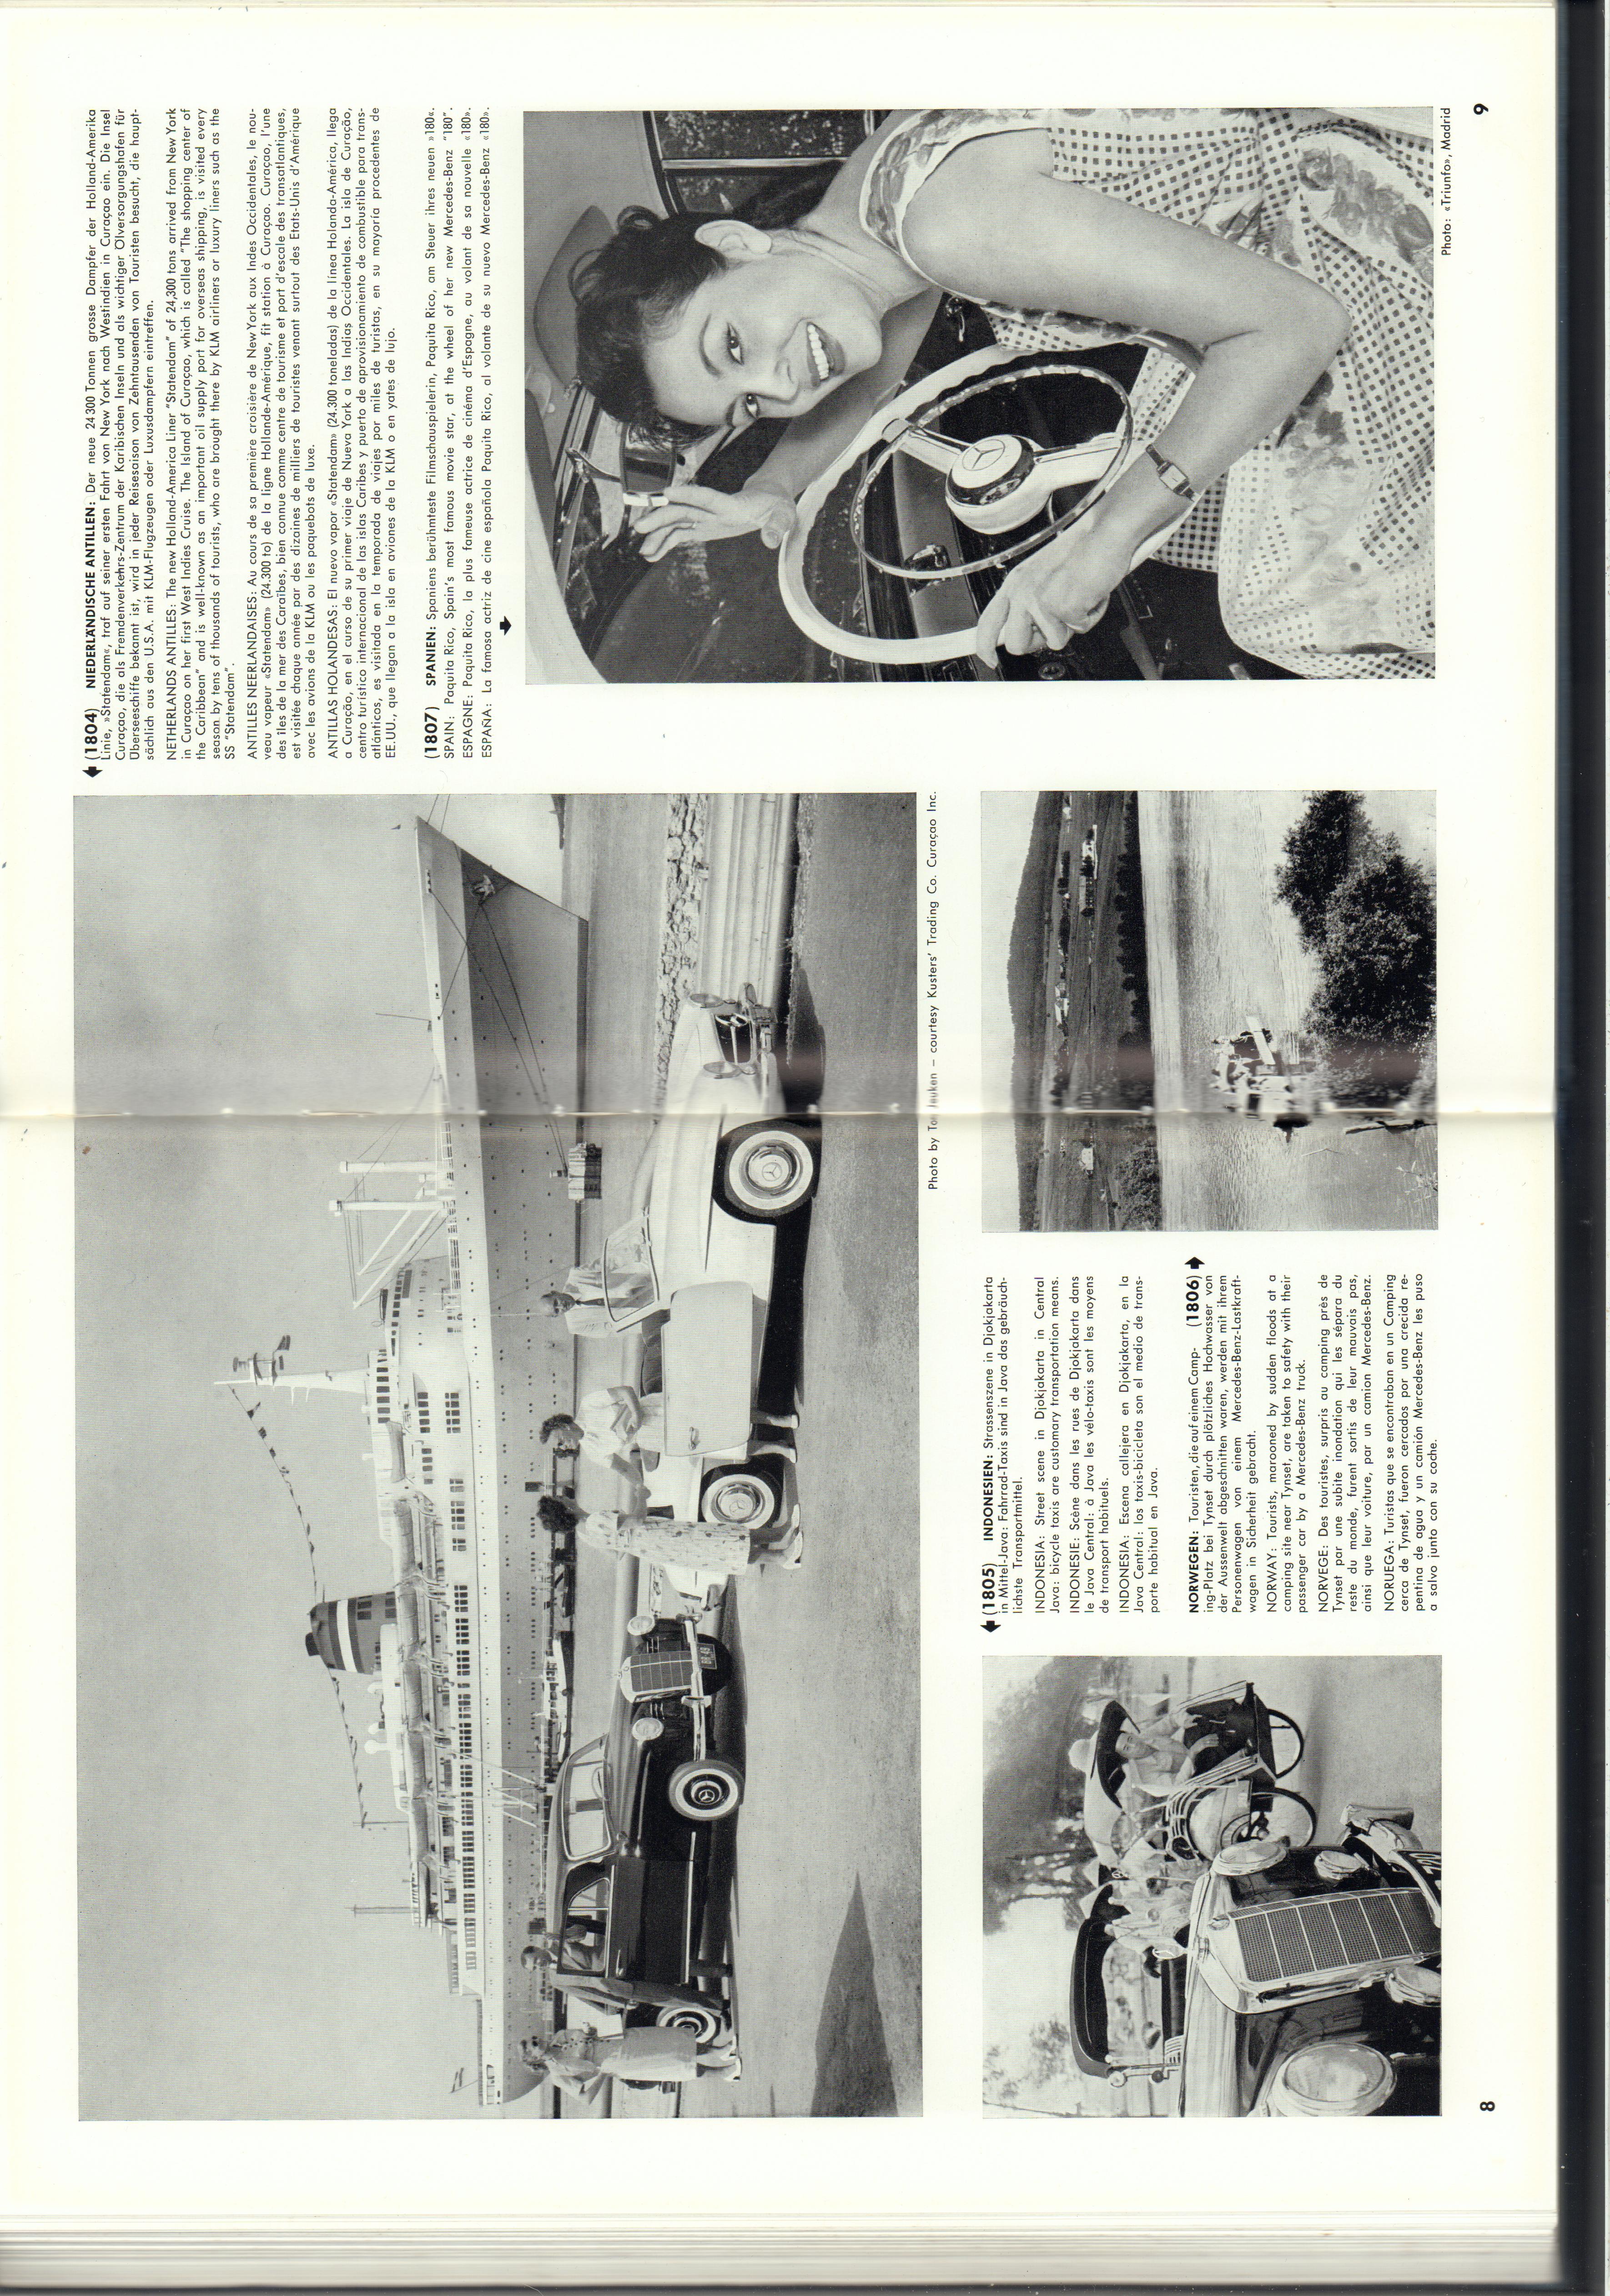 (REVISTA): Periódico In aller welt n.º 14 - Mercedes-Benz no mundo - 1957 - multilingue 005